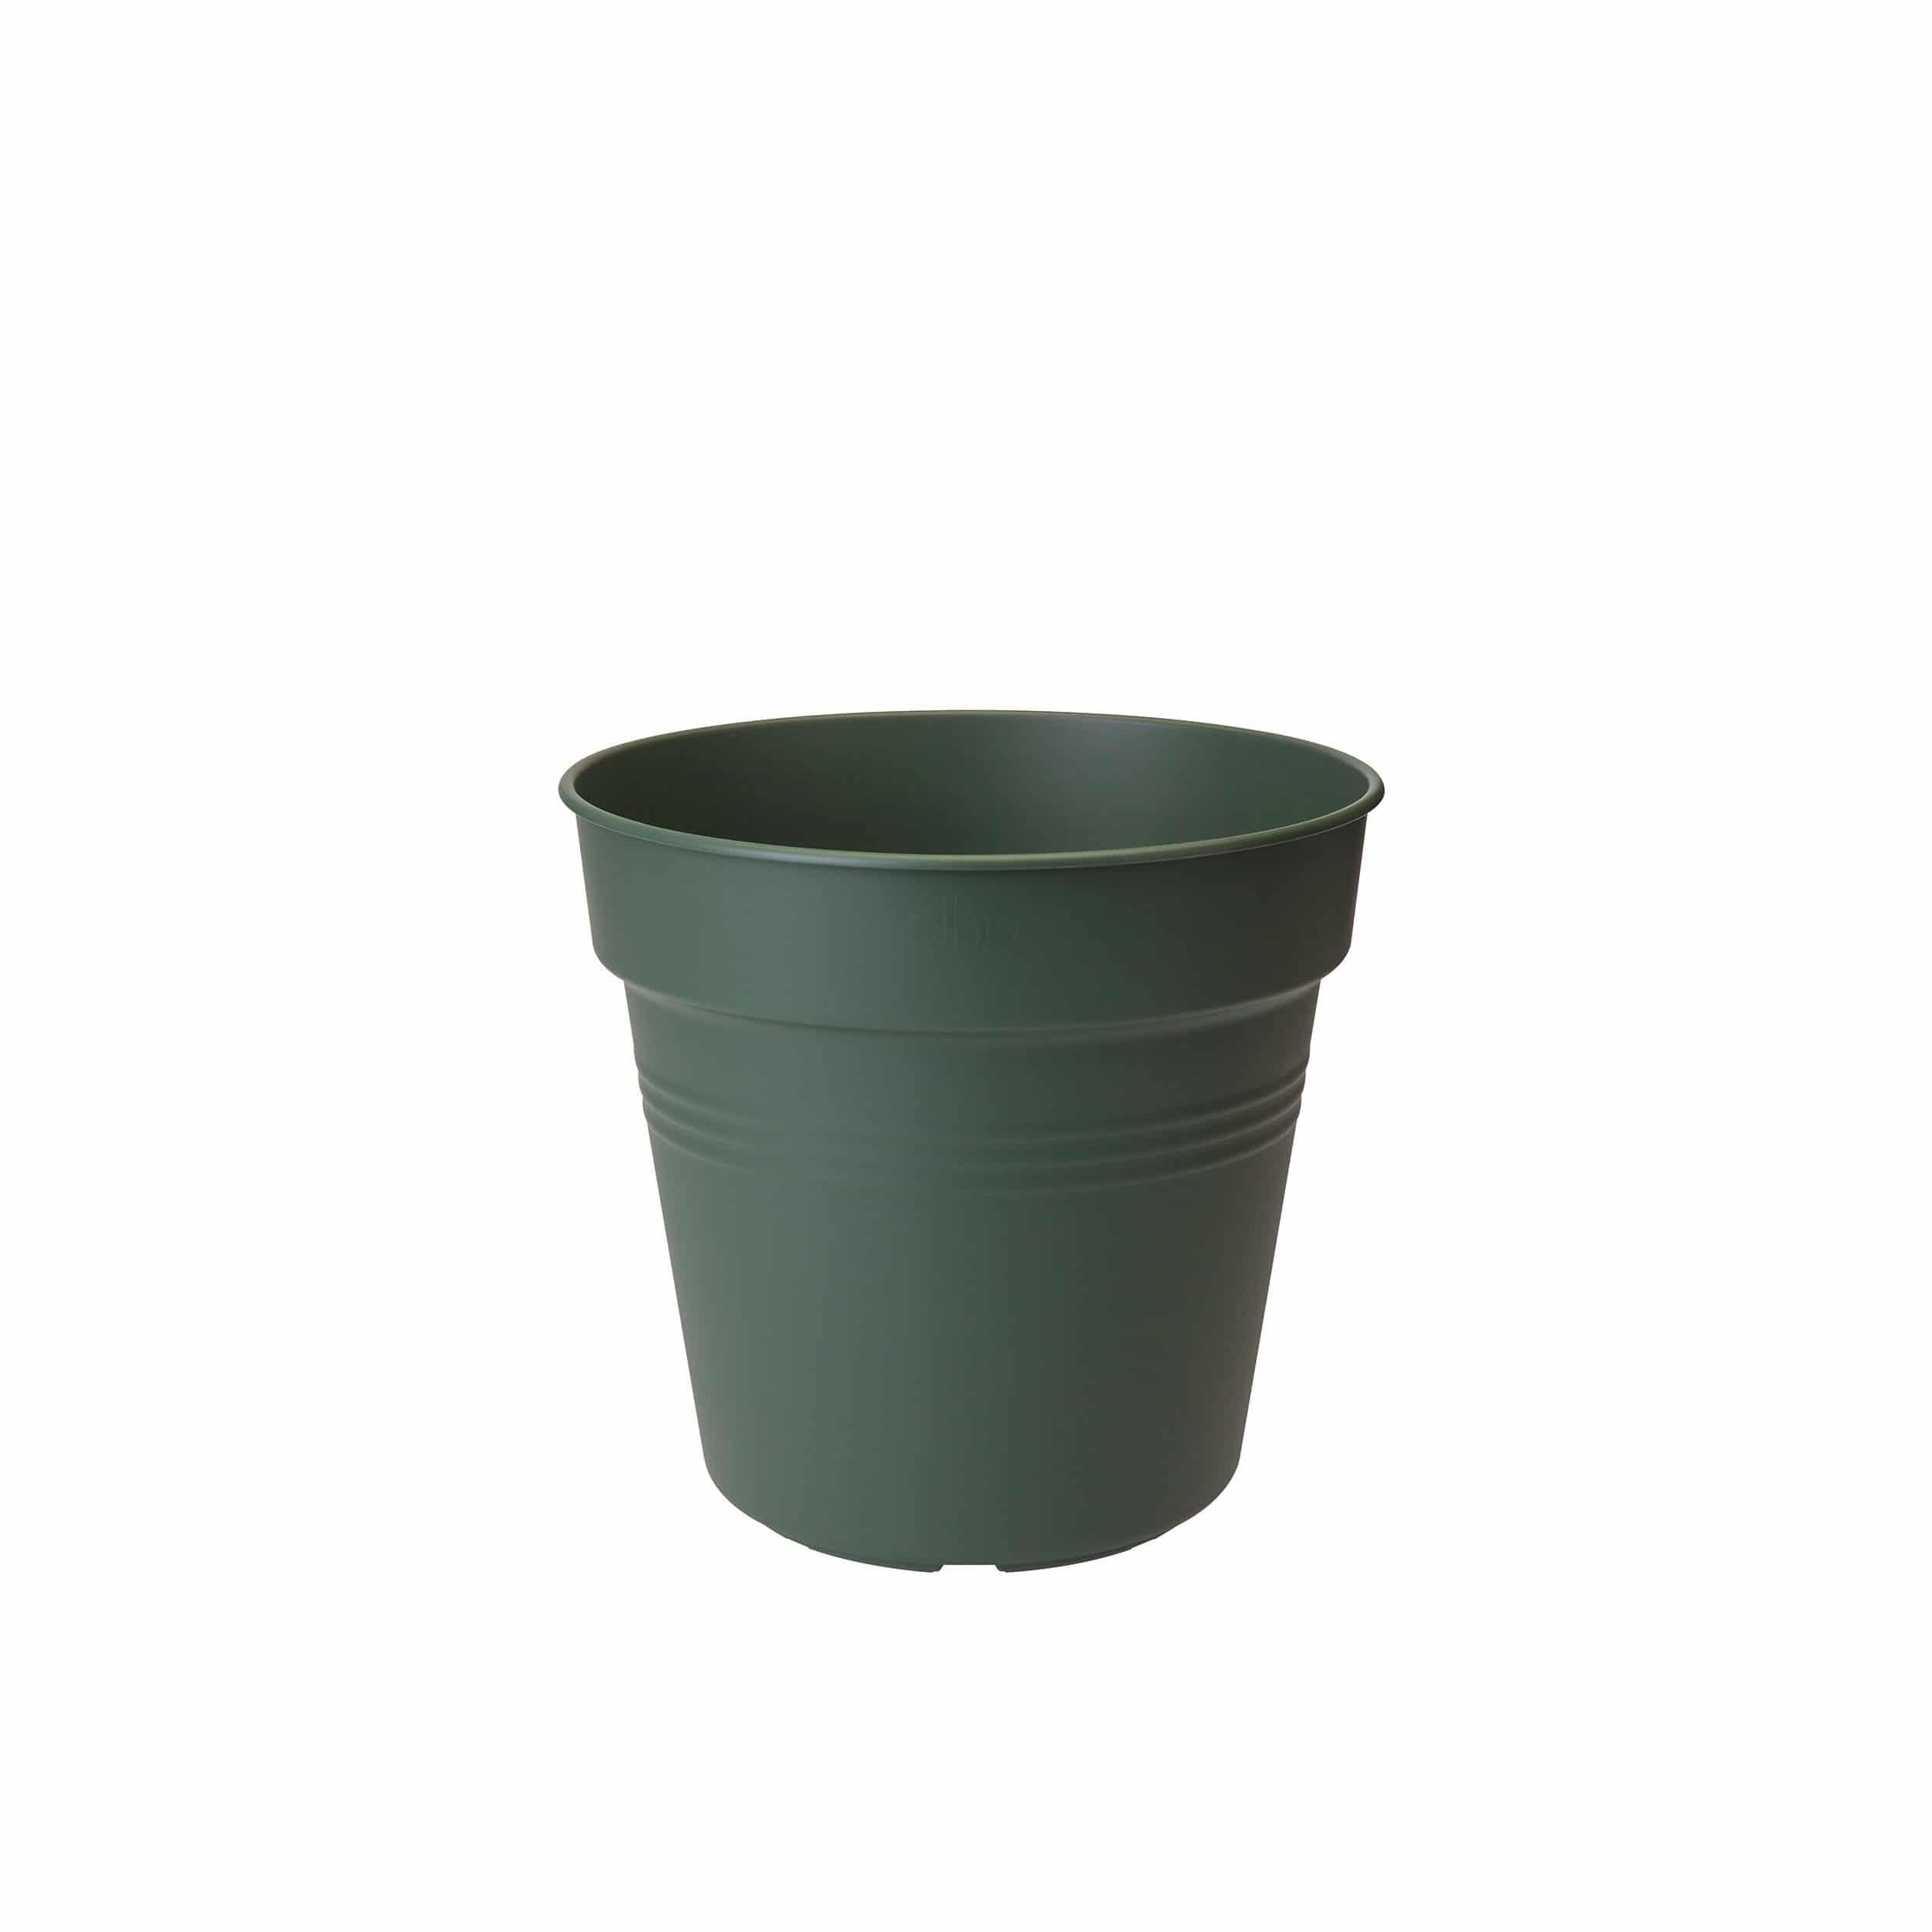 Anzuchttopf Green Basics D19cm laubgrün